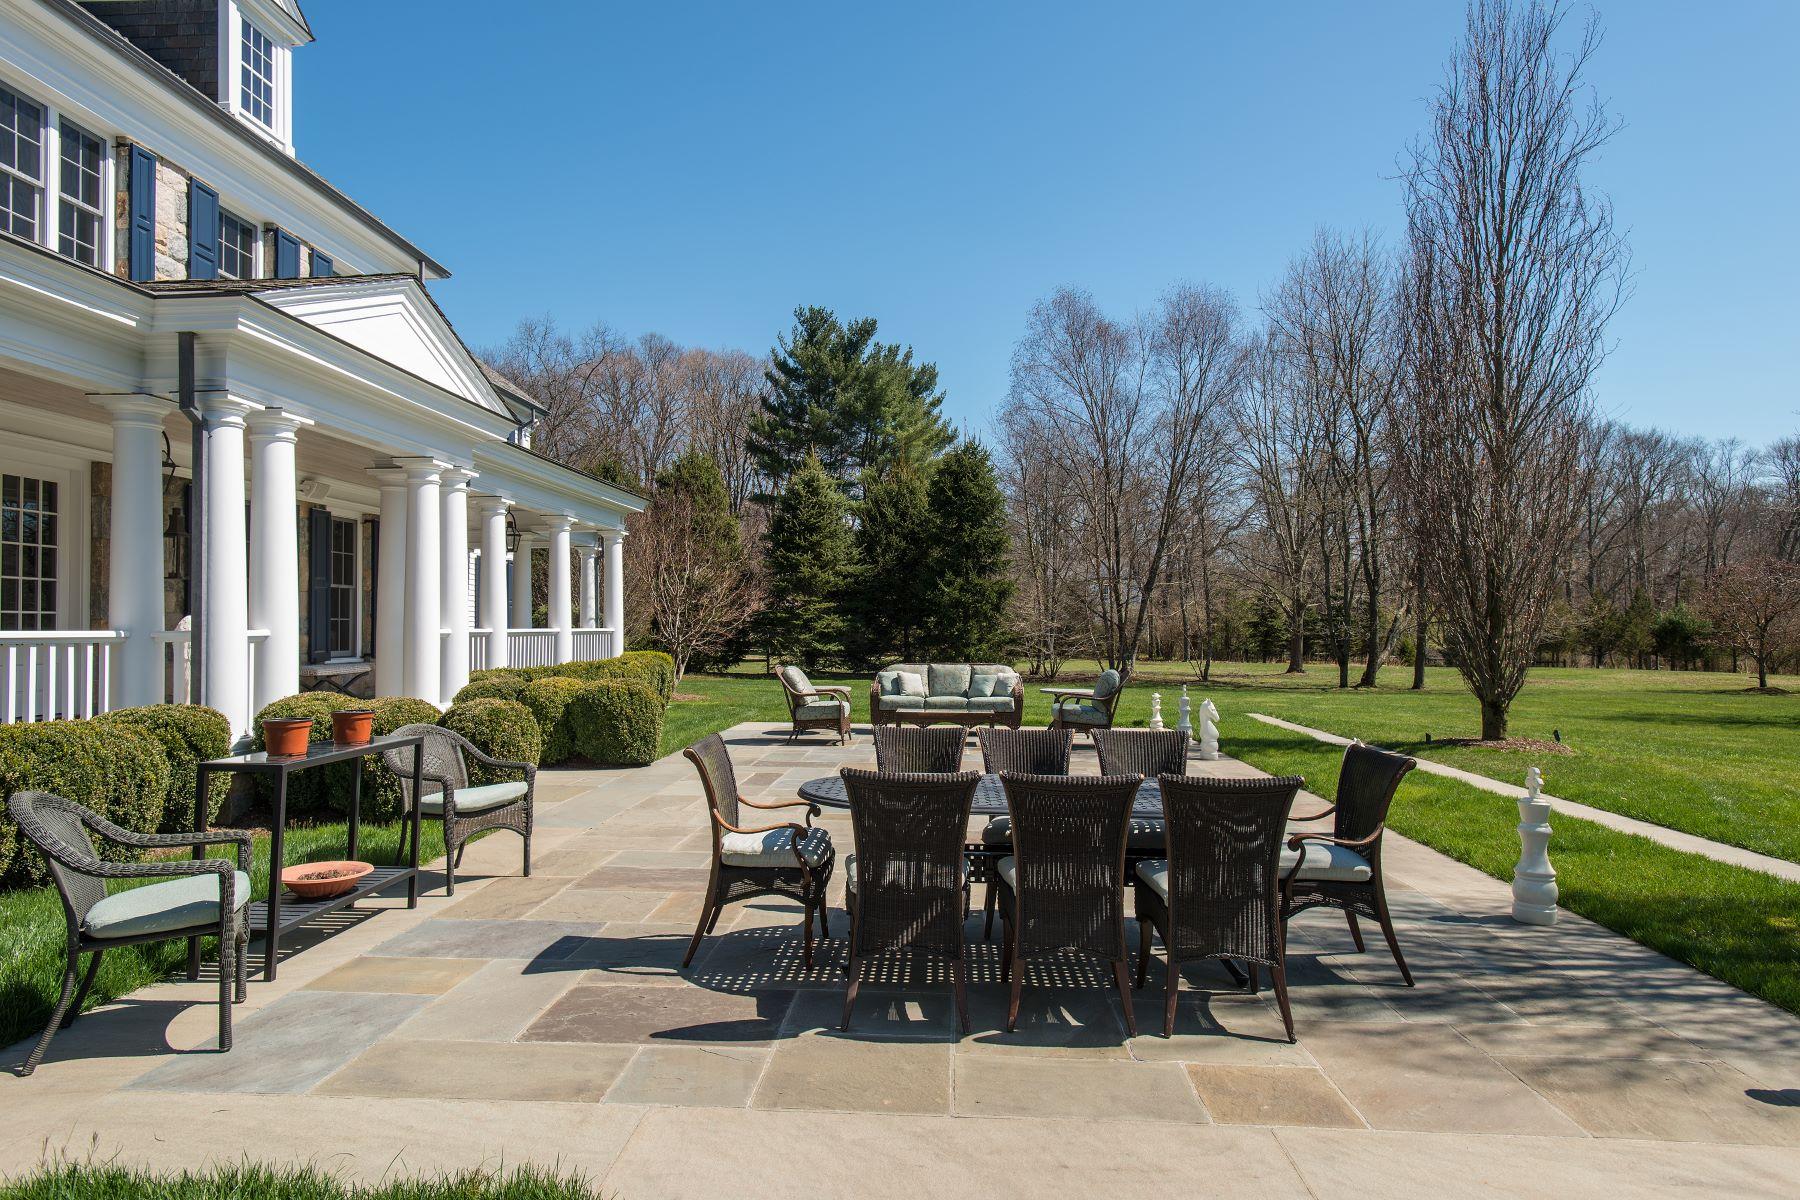 Additional photo for property listing at 1480 Ponus Ridge 1480 Ponus Ridge New Canaan, Connecticut 06840 United States